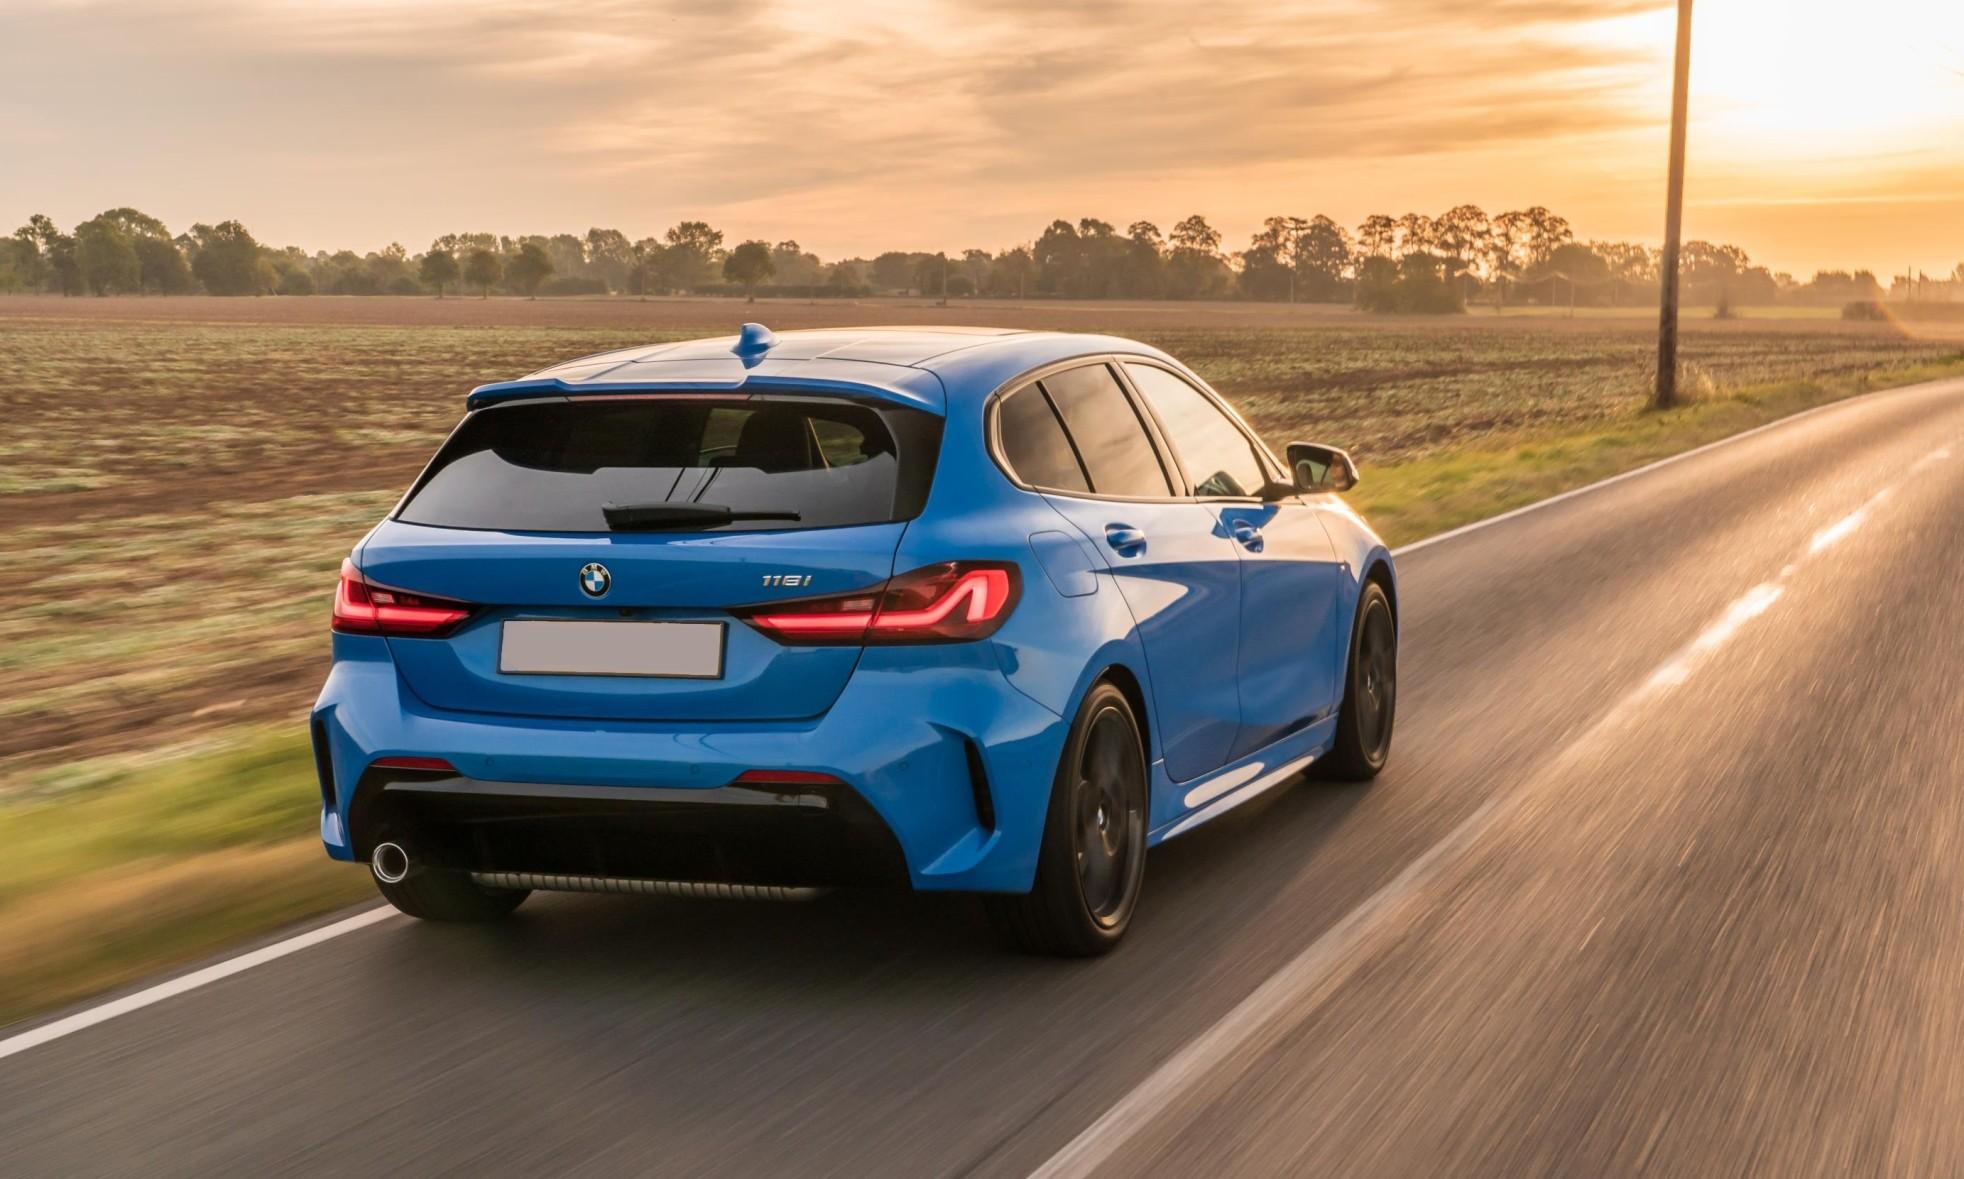 BMW 118i rear